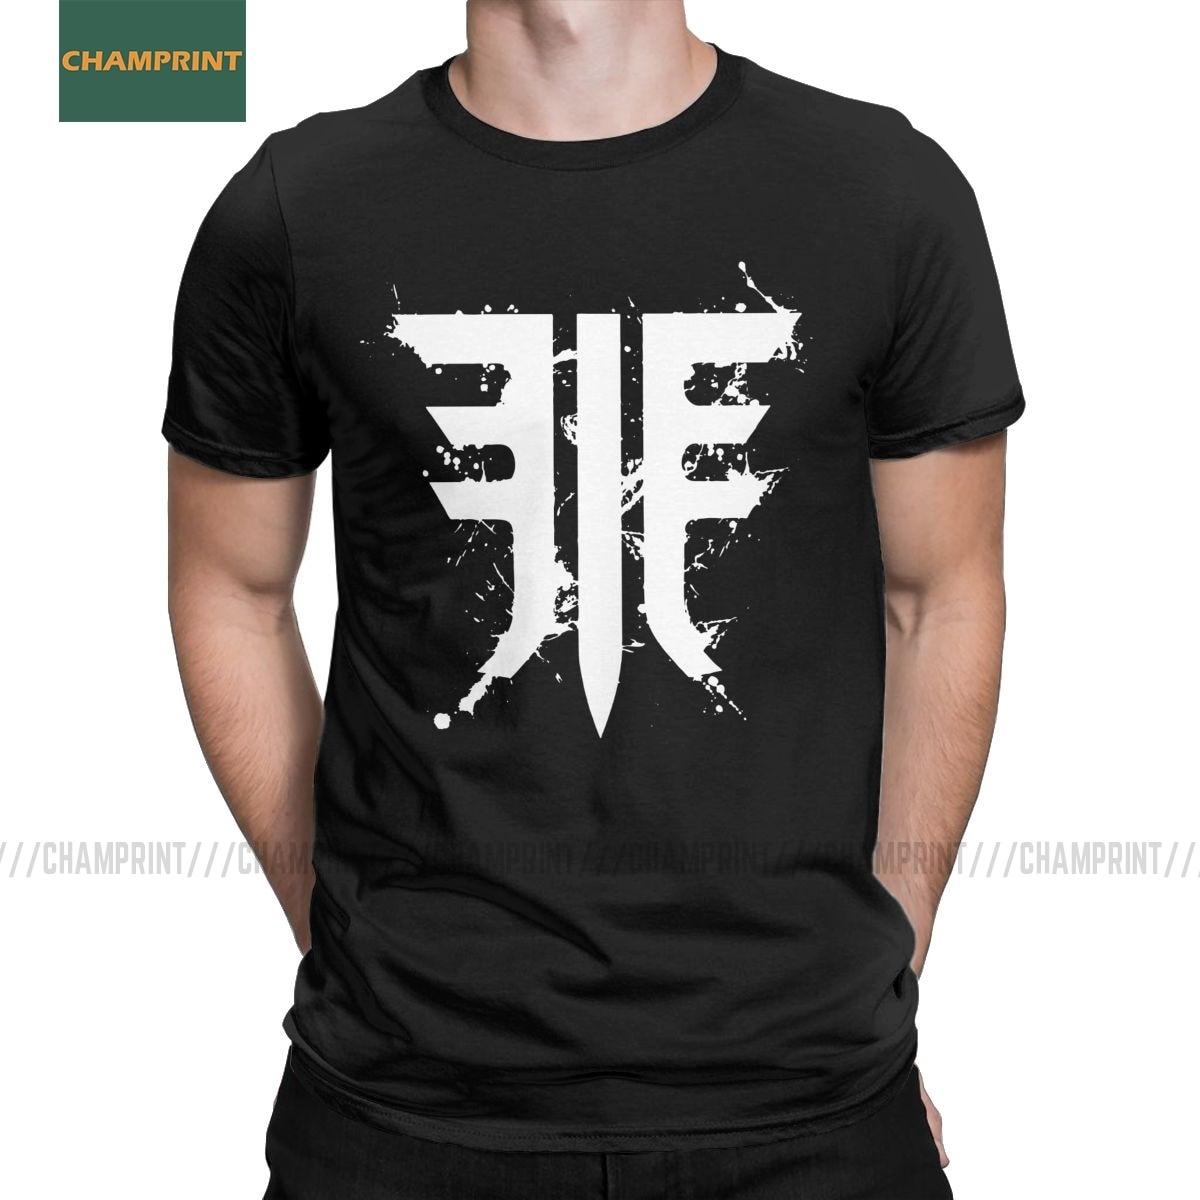 Destiny 2 T Shirts Forsaken Emblem T-Shirt for Men Ace Spades Cayde Cayde 6 Game Amazing Pure Cotton Tee Shirt Short Sleeve